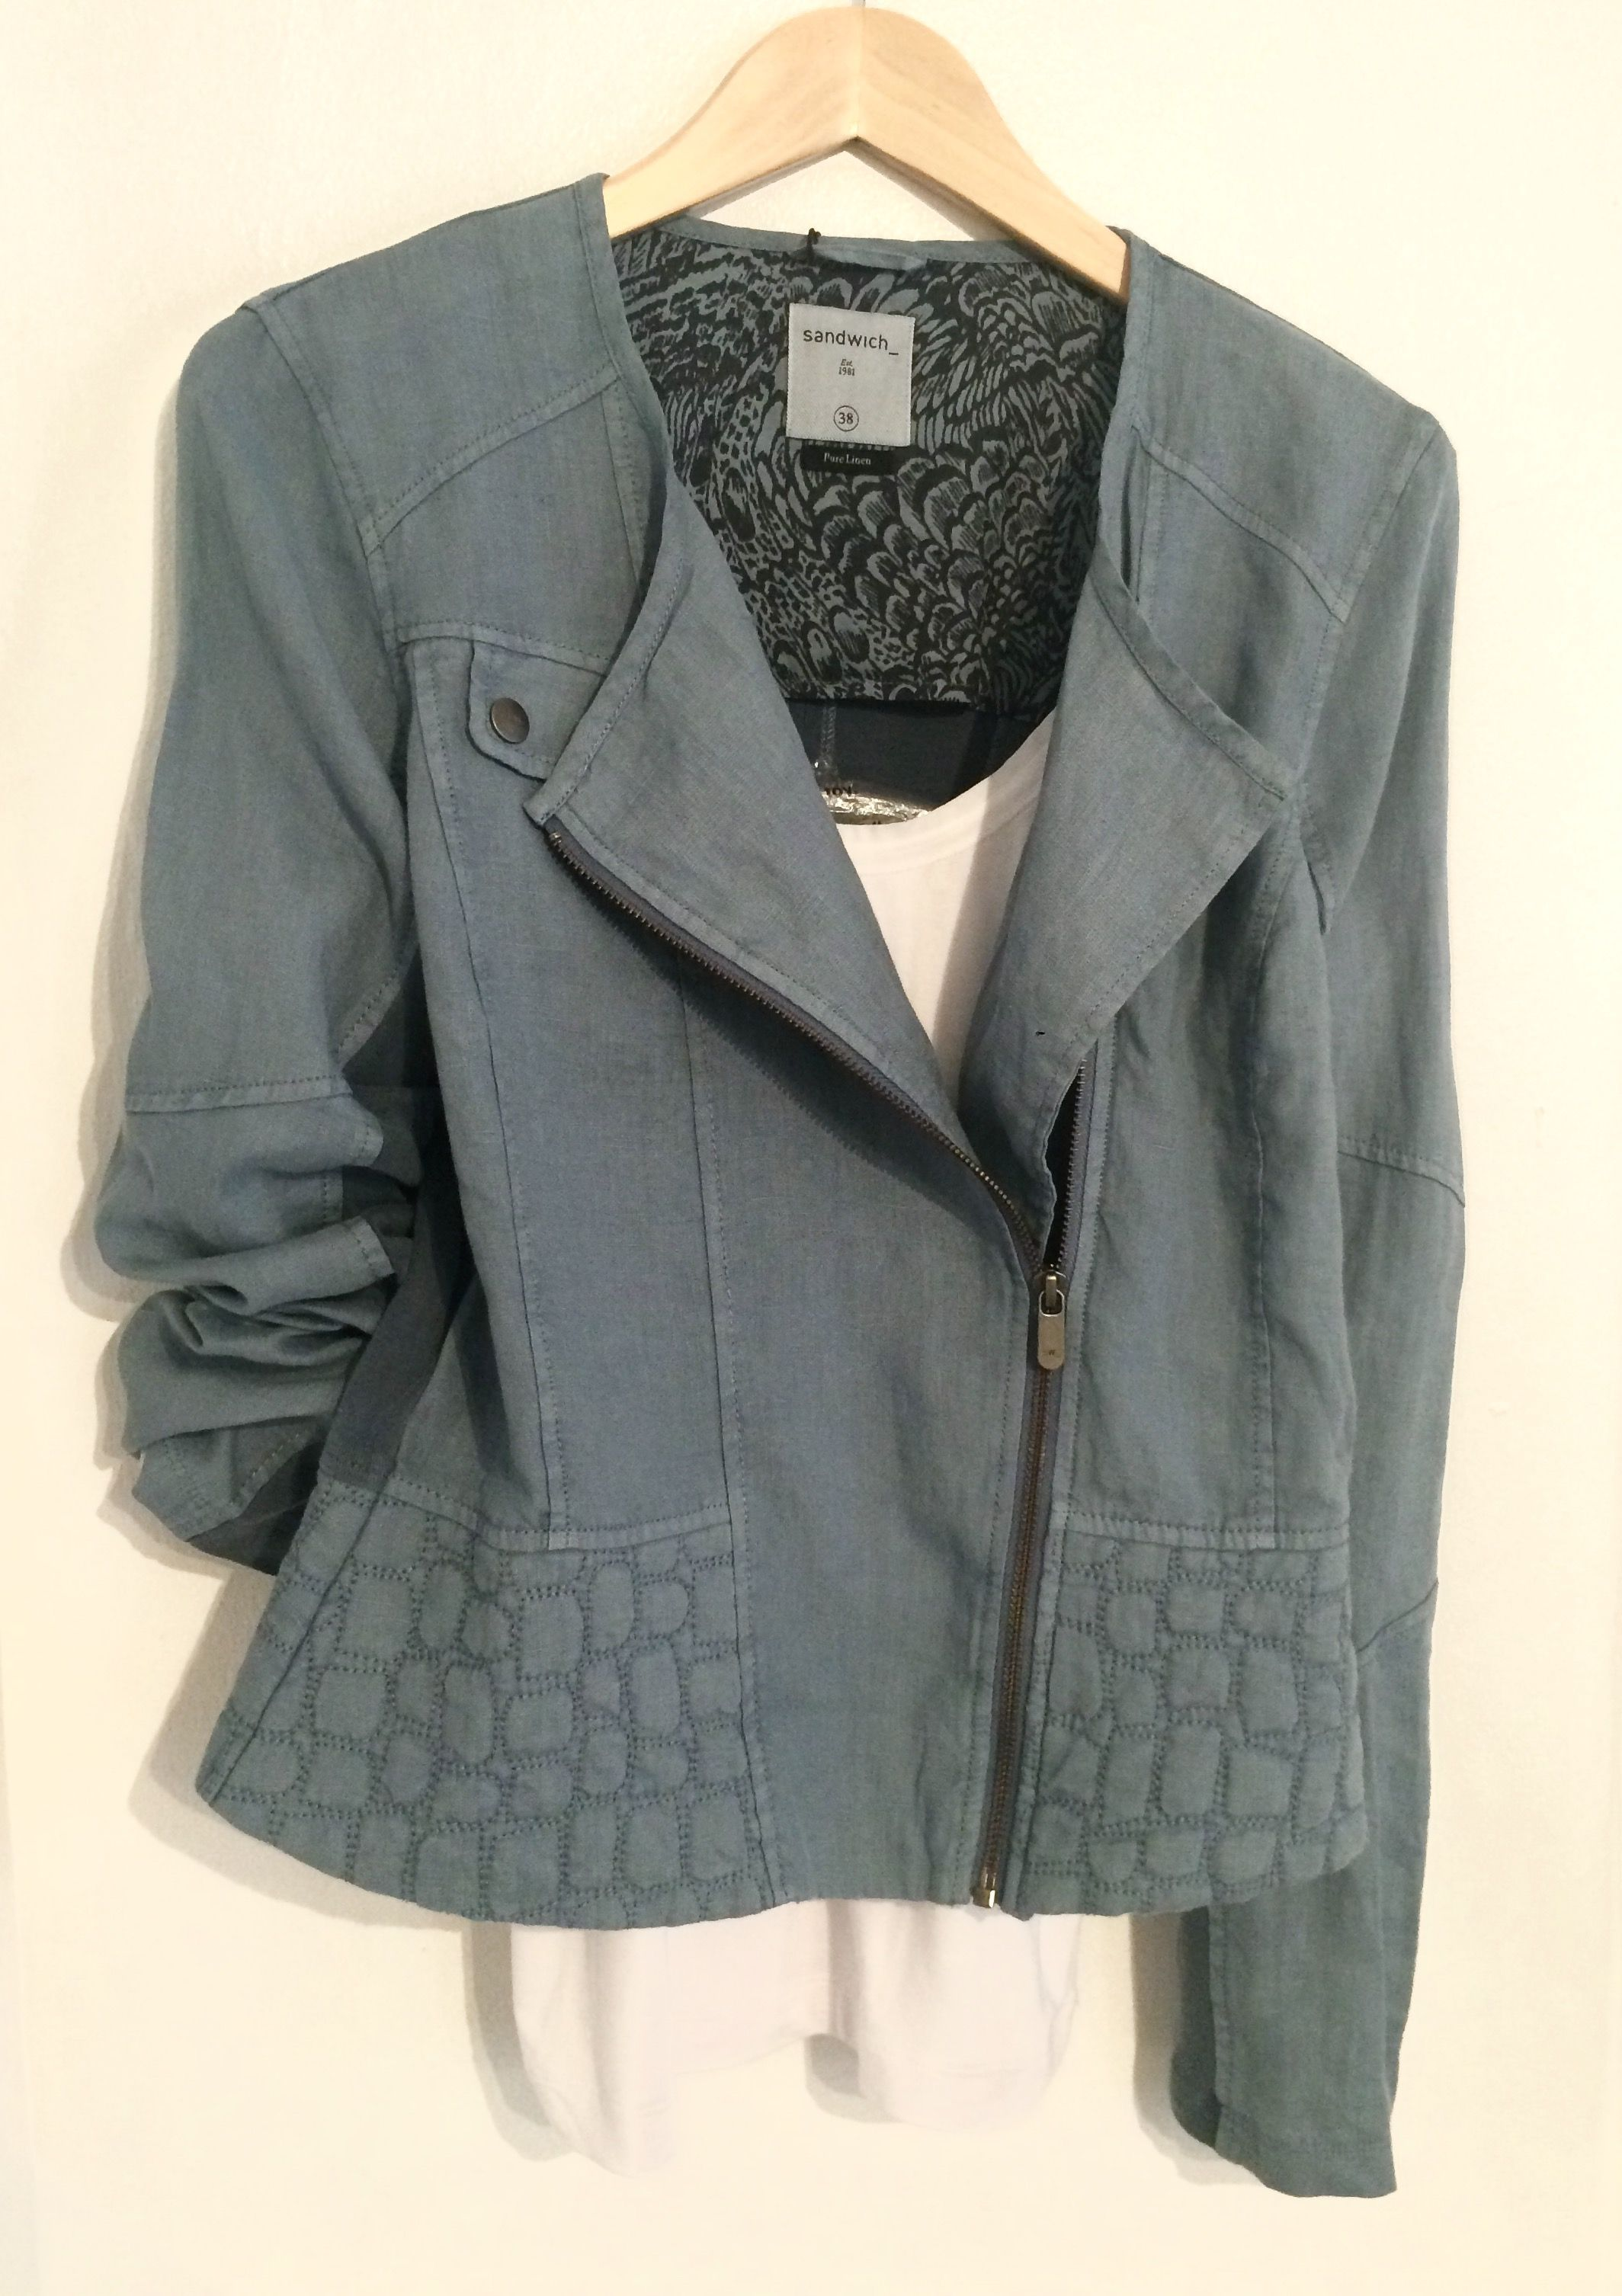 Sandwich teal linen jacket £119.95. InWear white camisole £22.95.